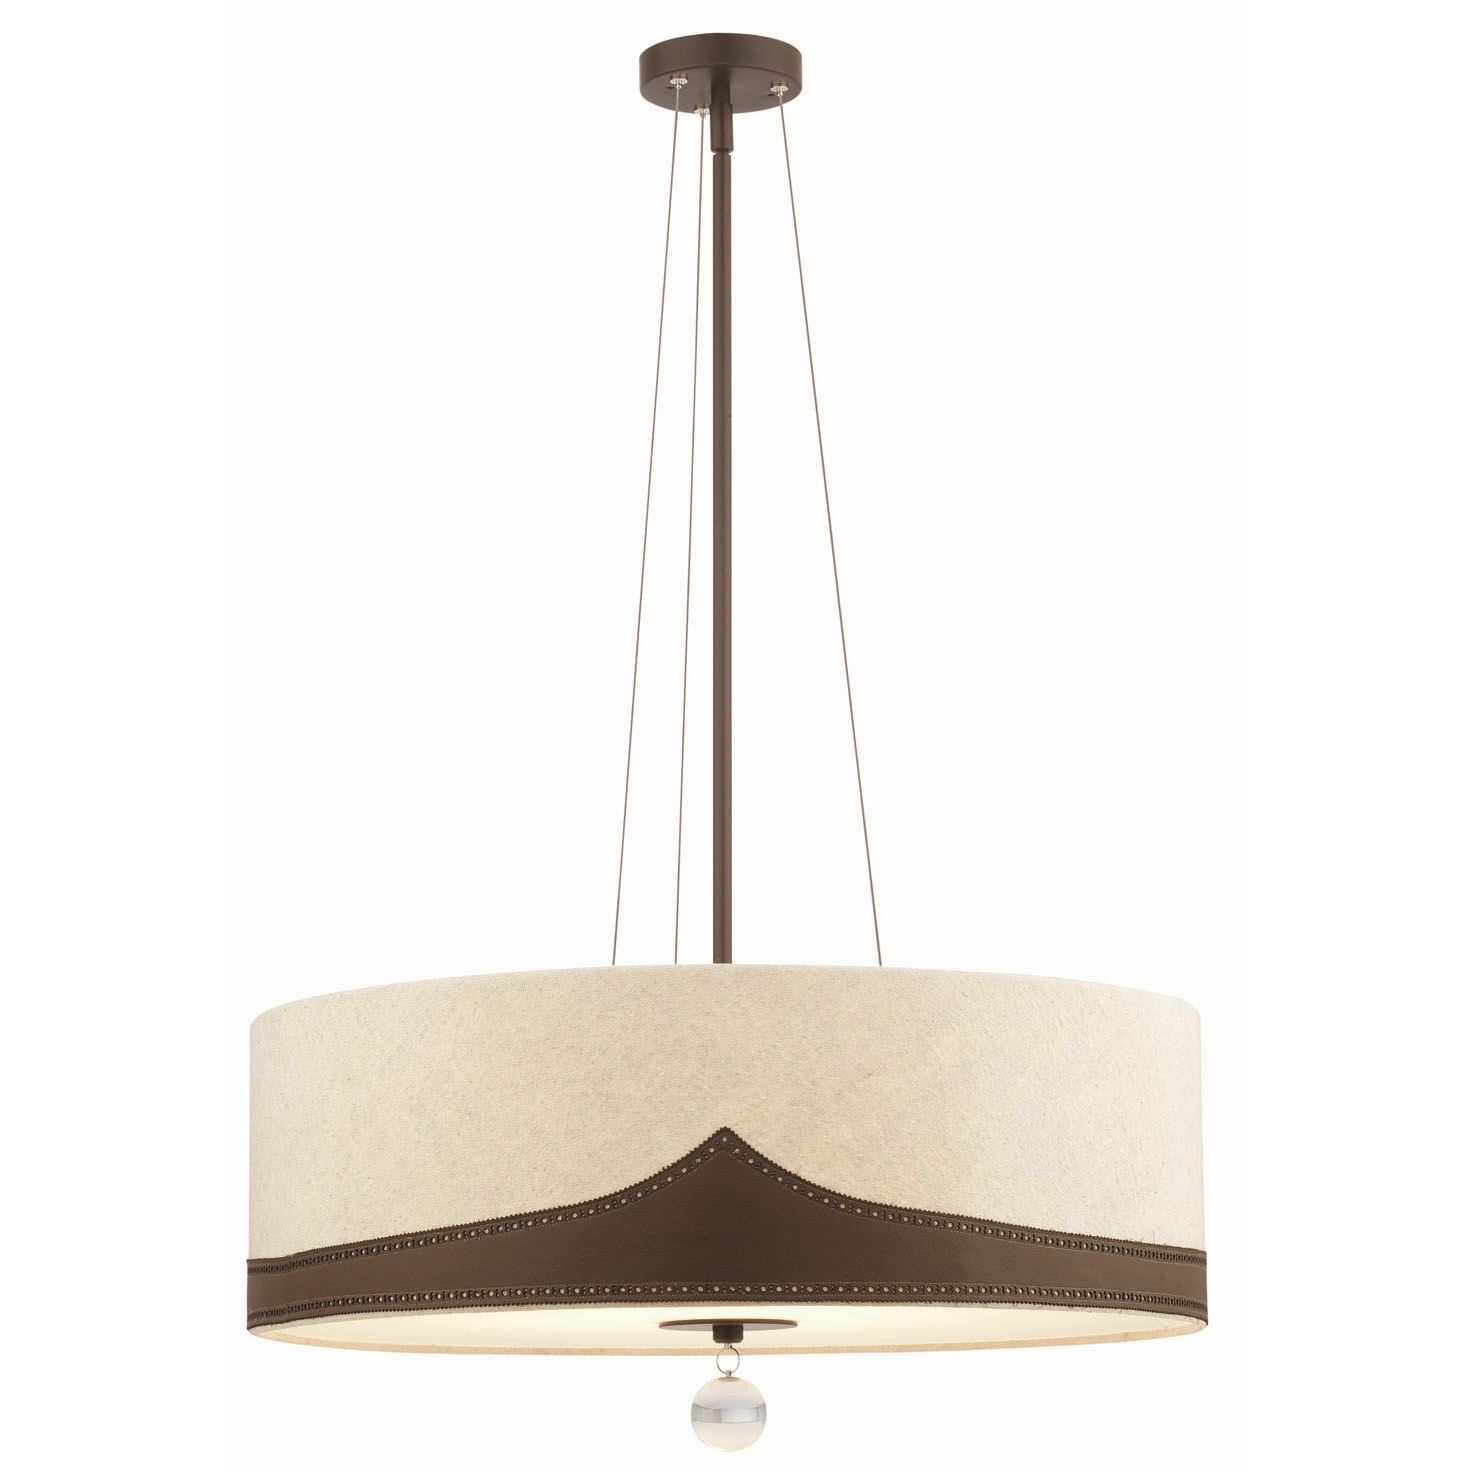 philips forecast lighting wing tip three light pendant philips